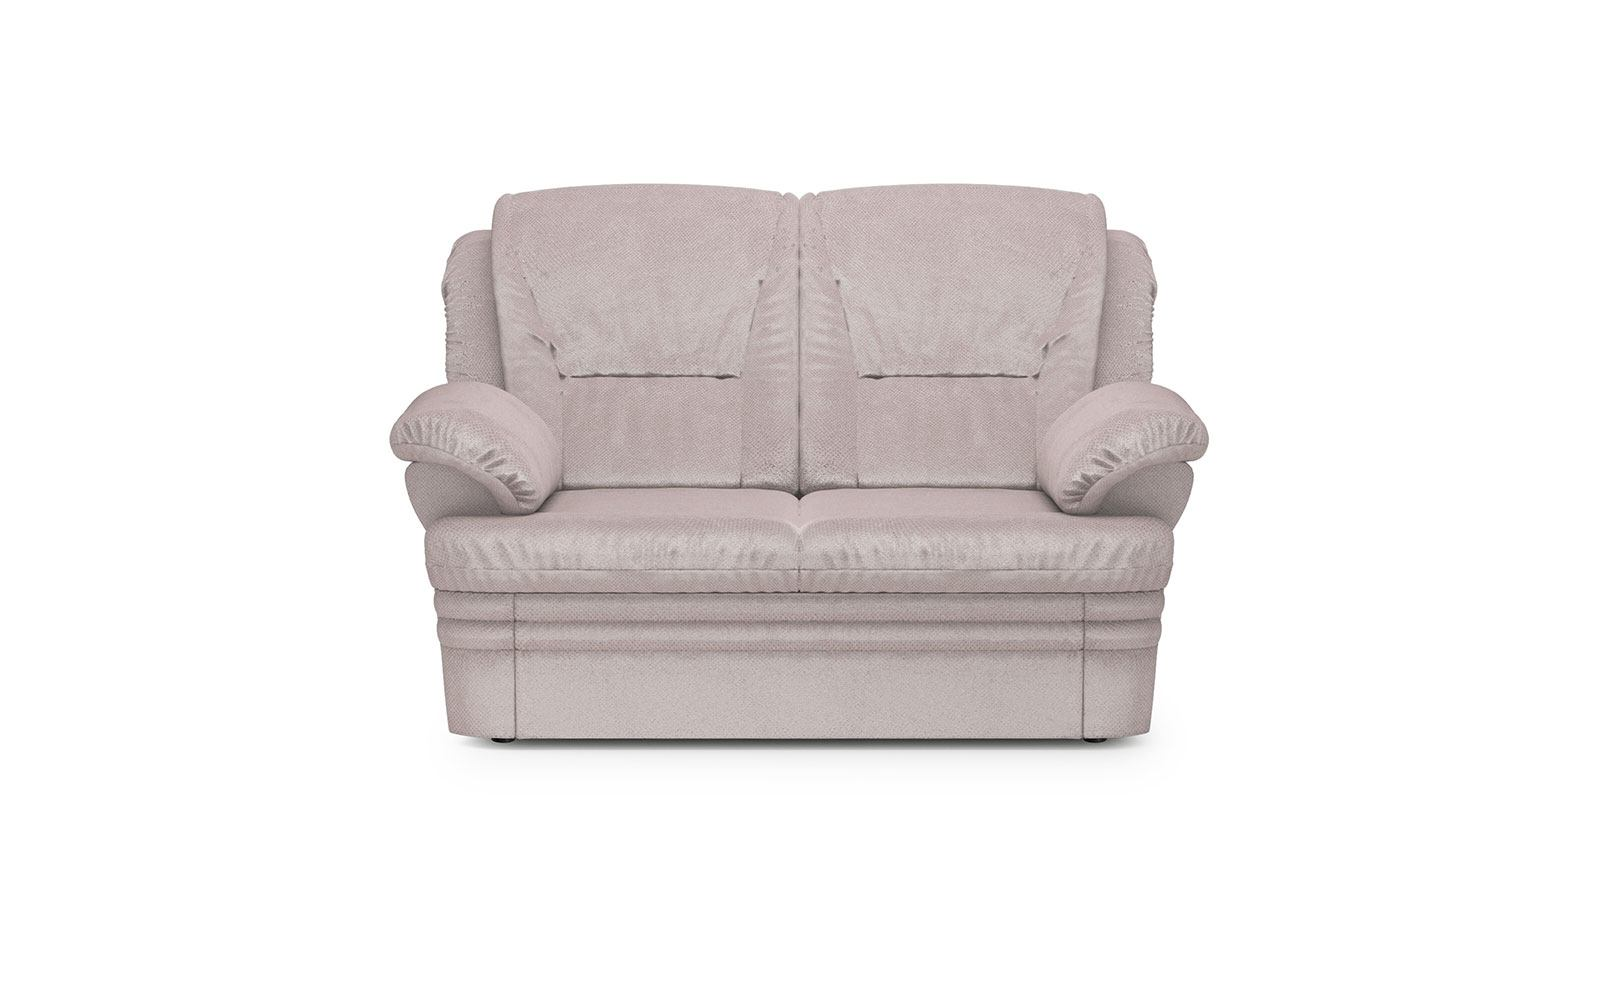 Dubai Sofa 2 With A Container - soft velur powder pink